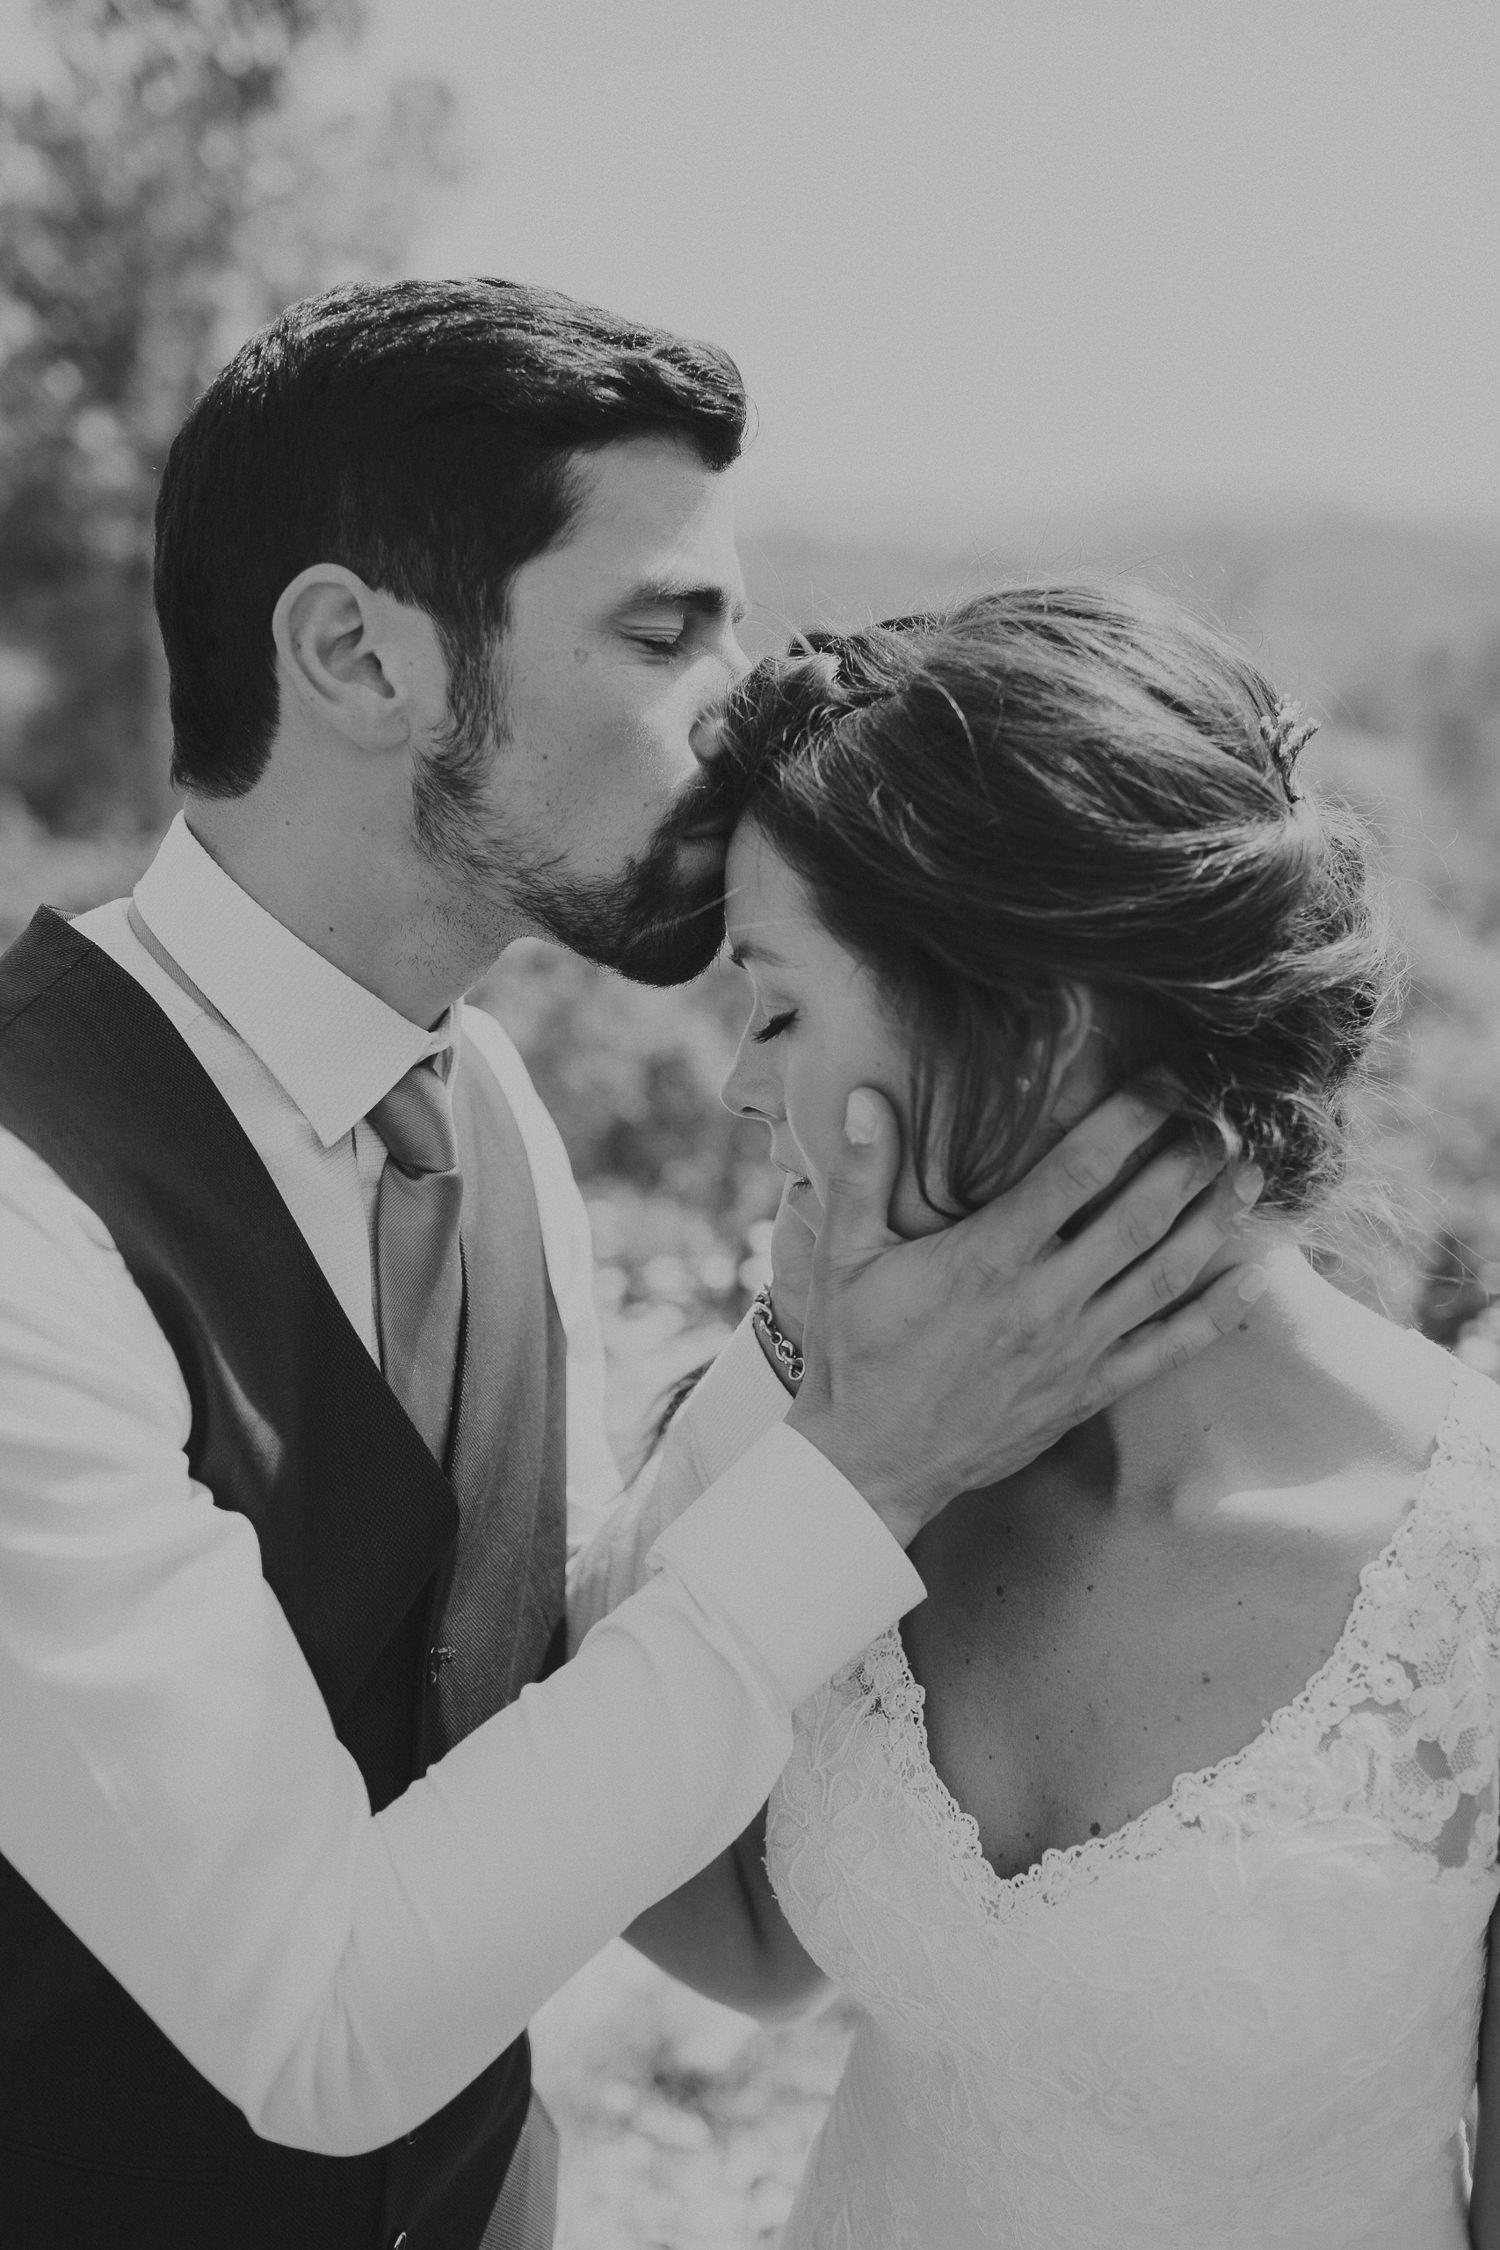 Countryside Wedding - Liron Erel - Echoes & Wildhearts 0036.jpg